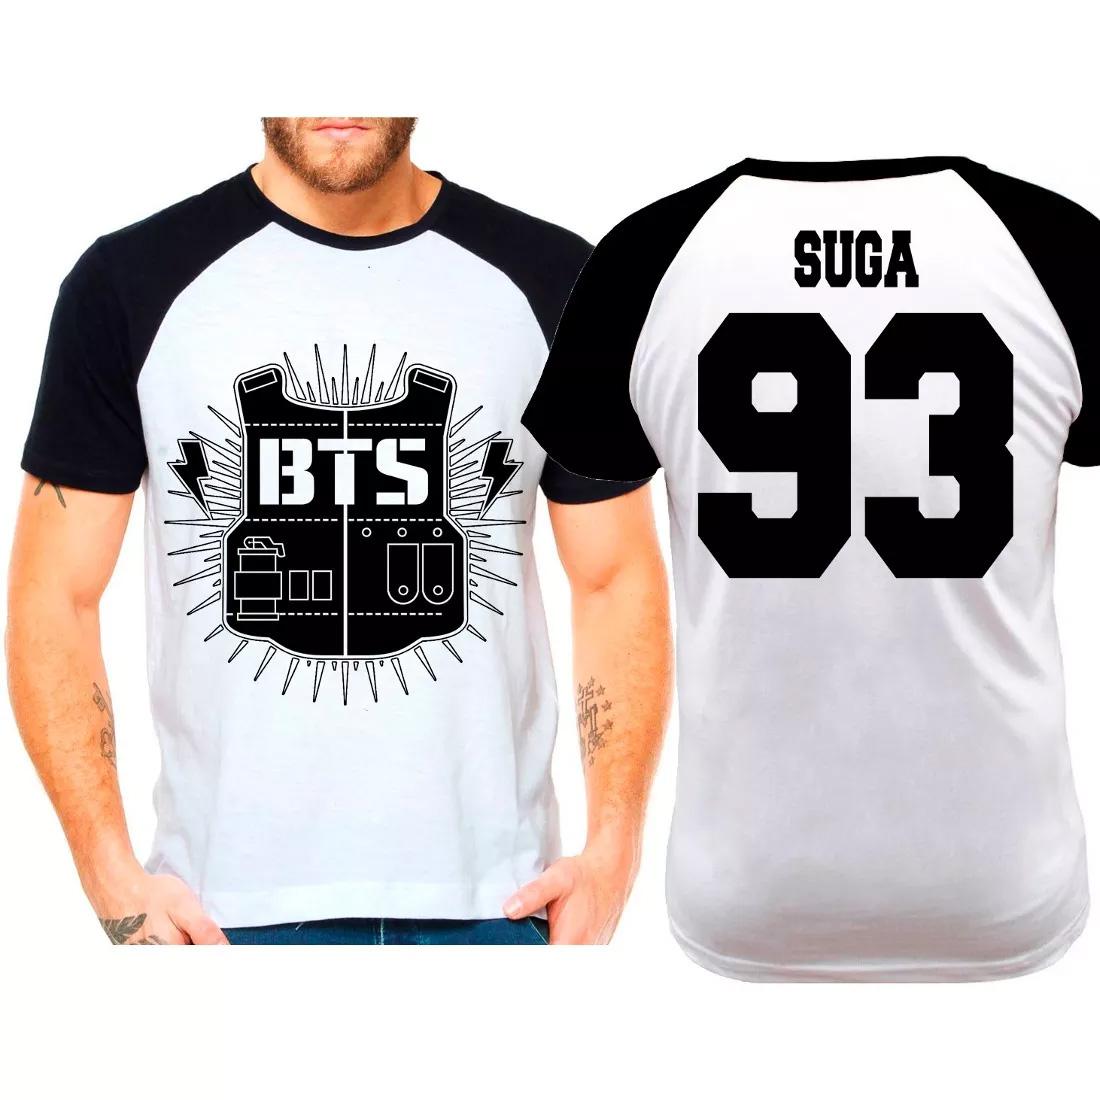 6d84eb066dfc2 Camiseta Raglan Kpop Bts Suga 93 no Elo7